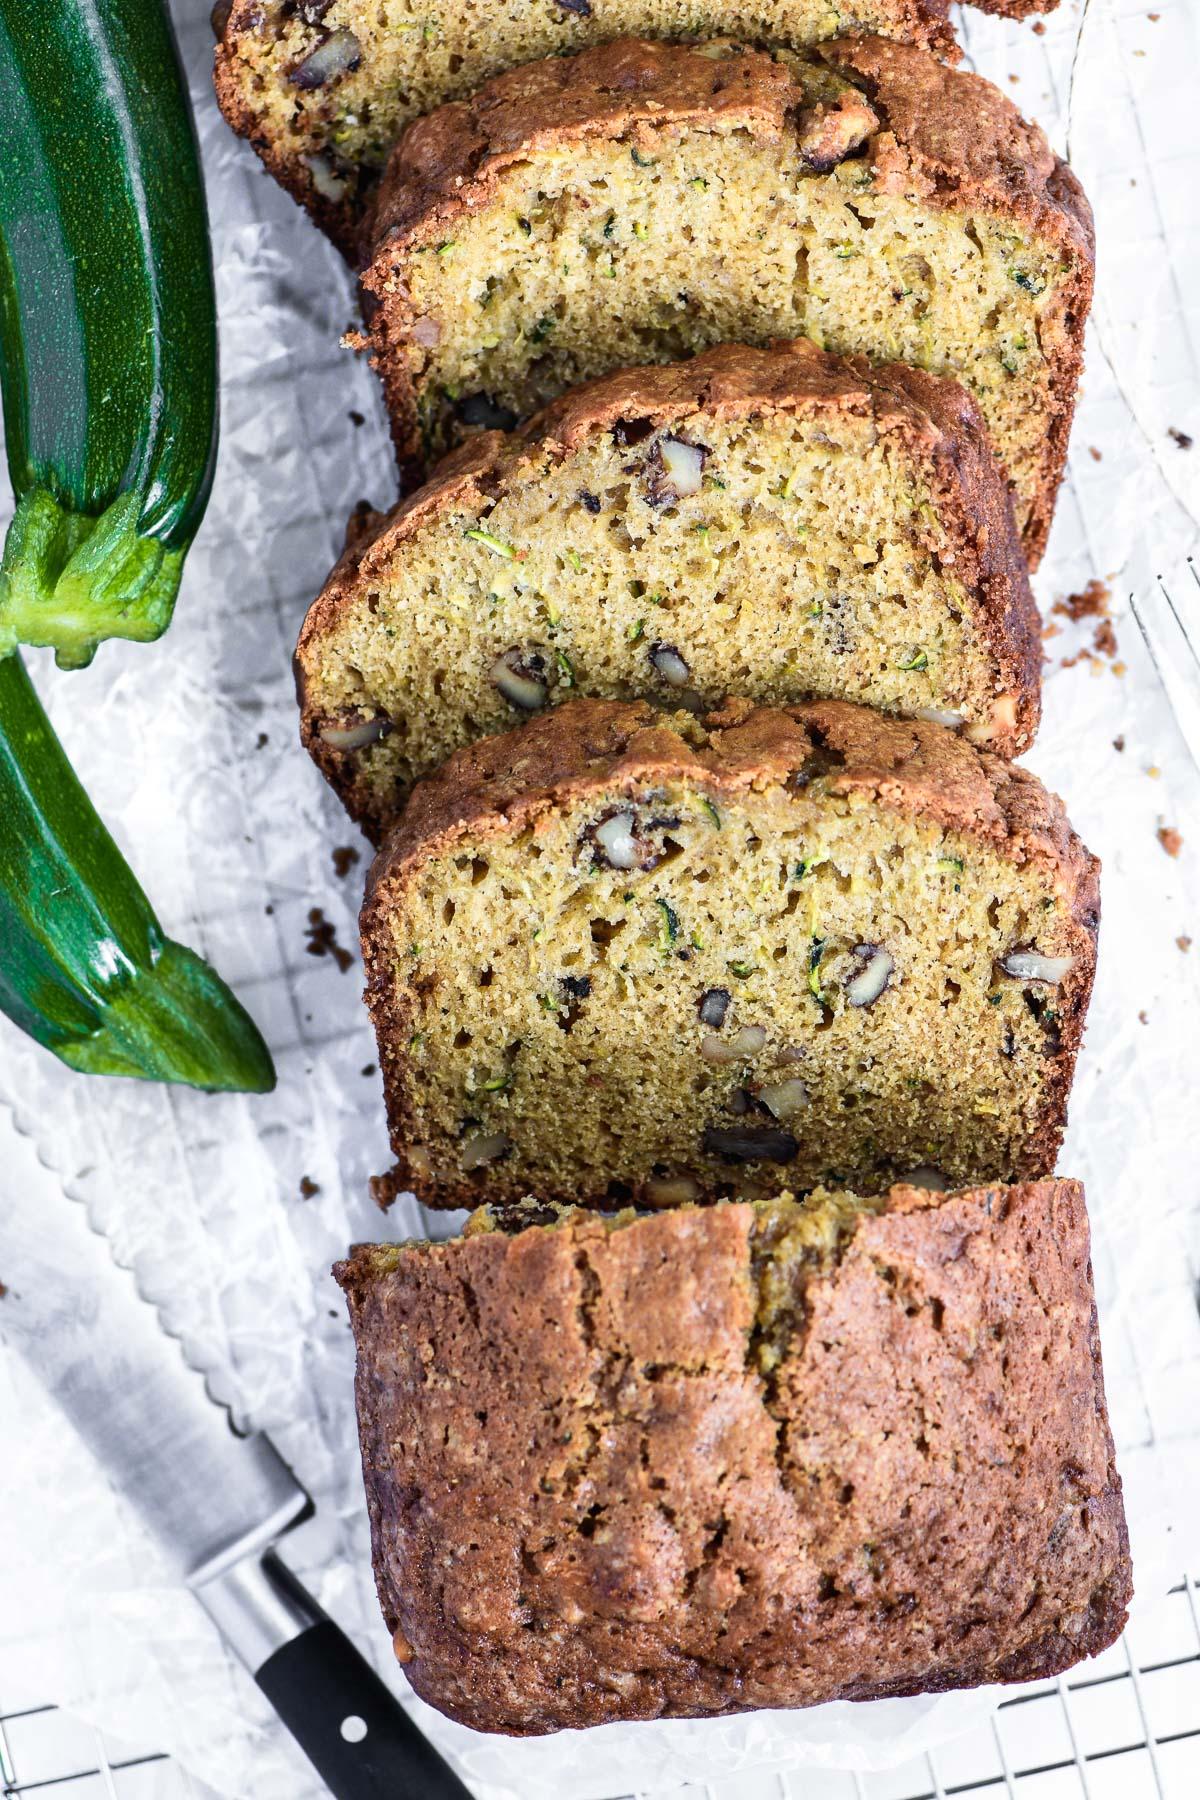 zucchini bread with knife and zucchini